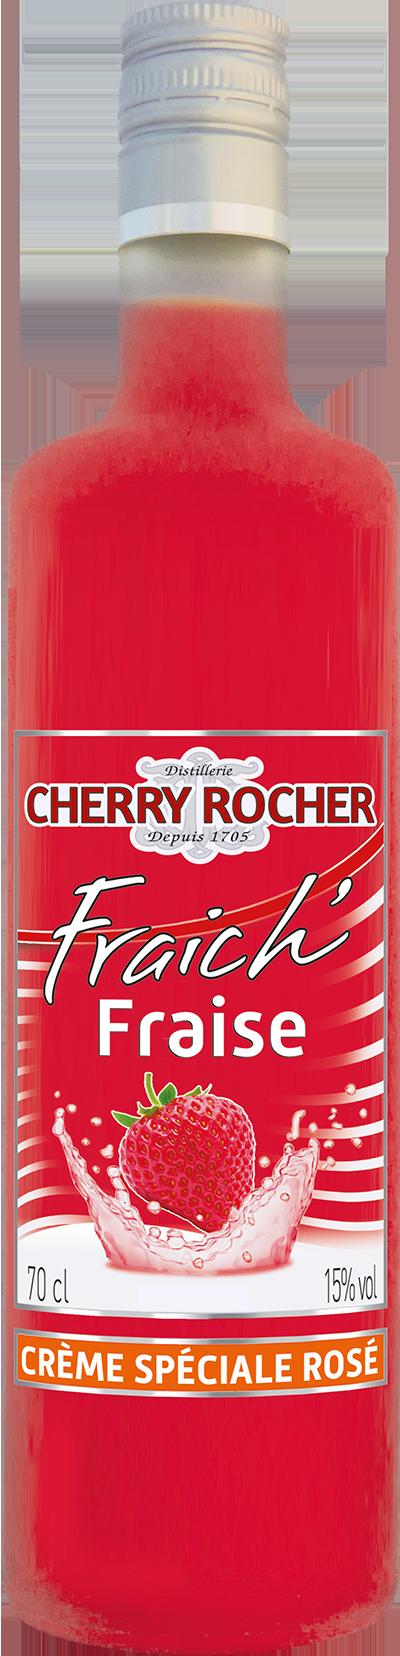 Fraich' Strawberry - Cherry Rocher